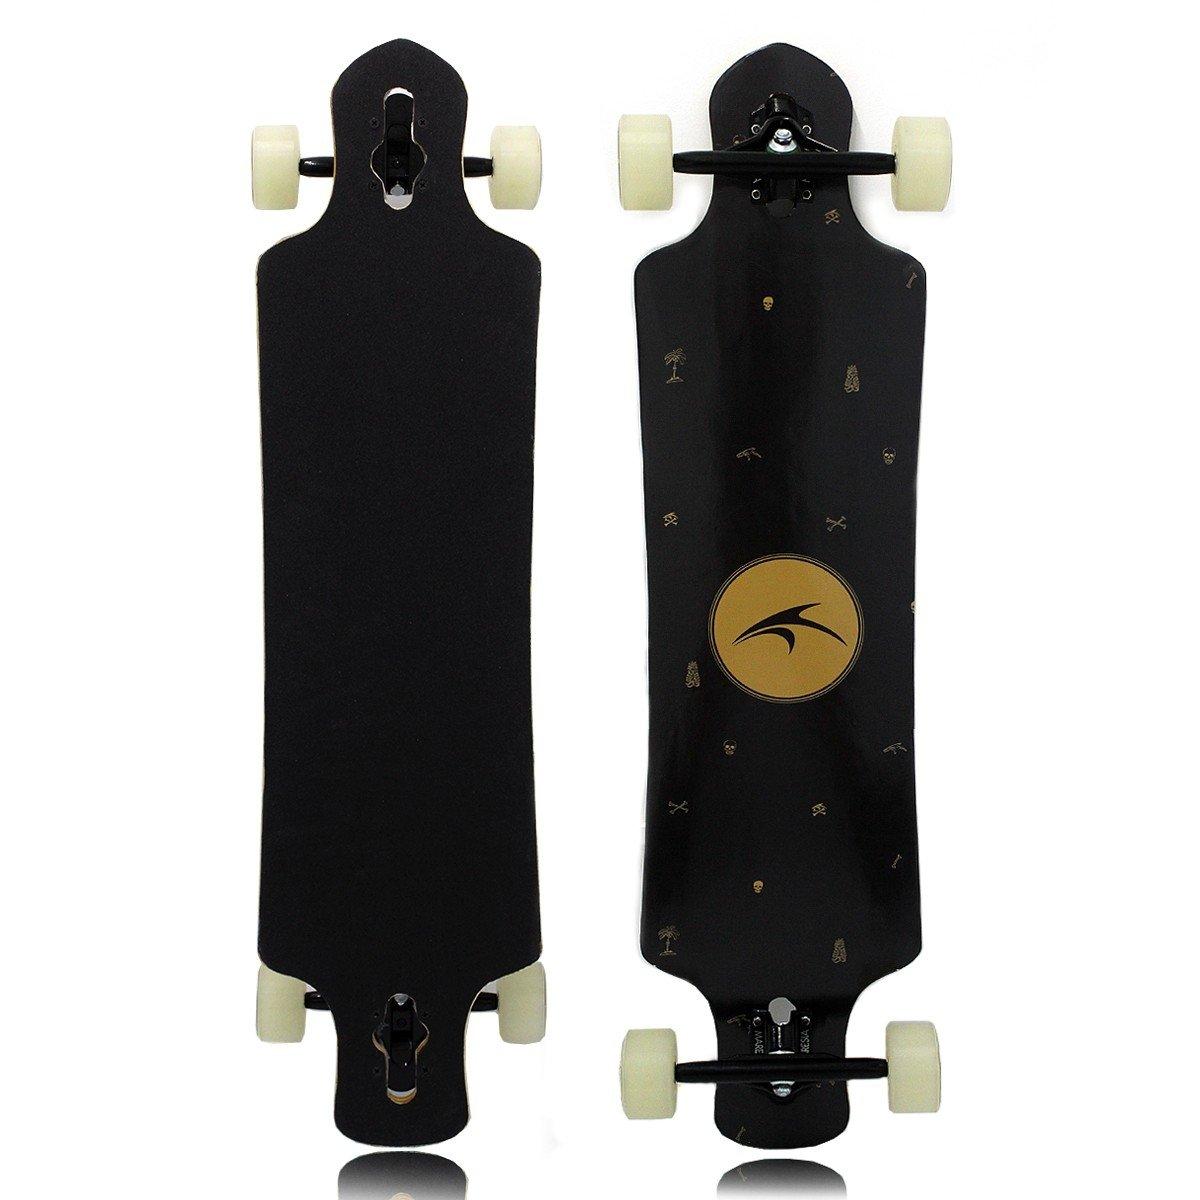 8b9449bea9f5d Longboard Maresia Black - Compre Agora